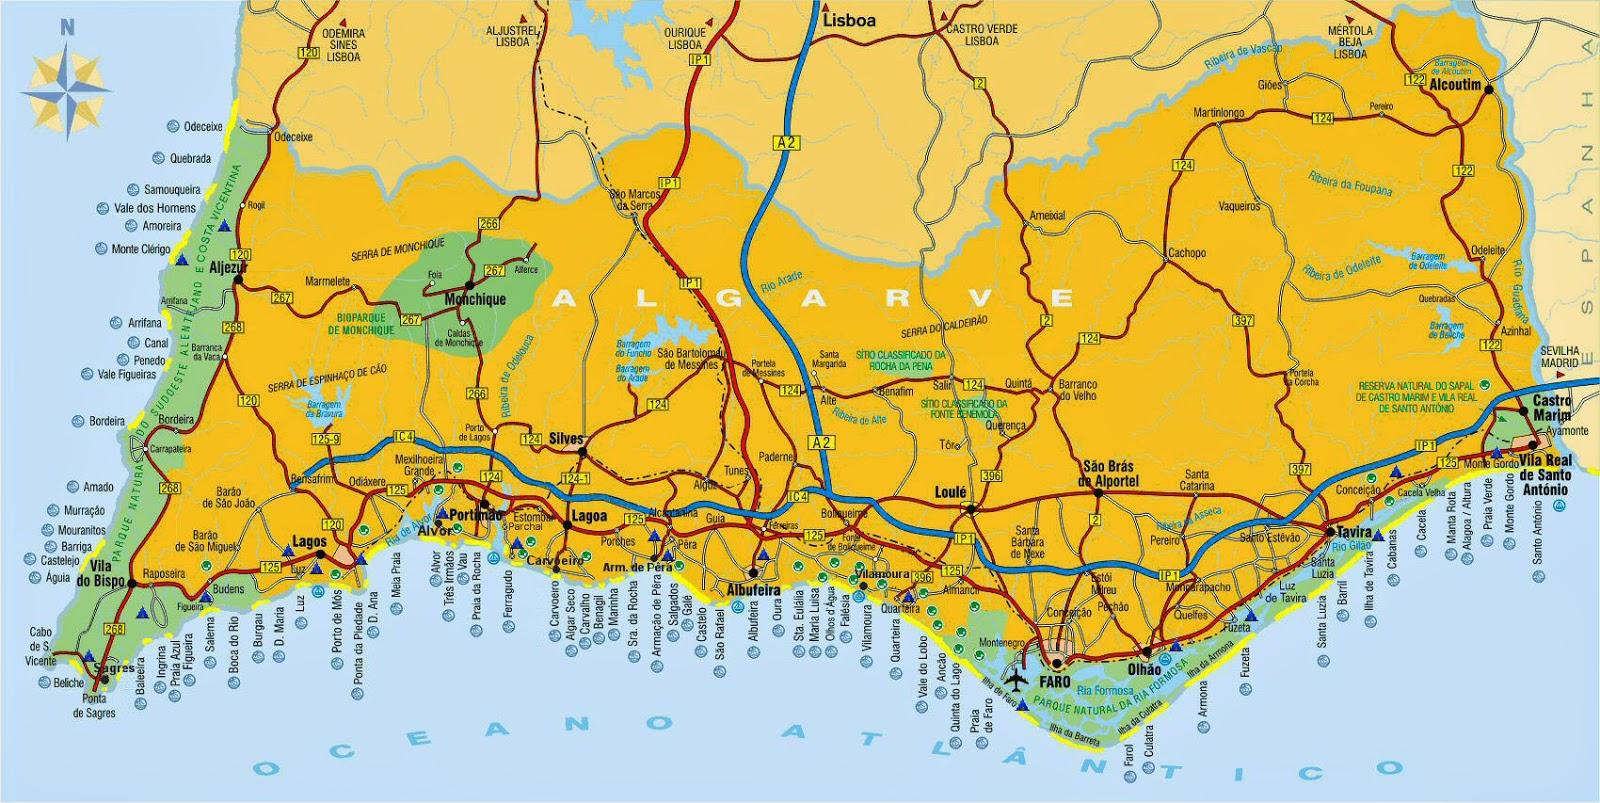 praias lisboa mapa Mapas de Lagos   Portugal | MapasBlog praias lisboa mapa